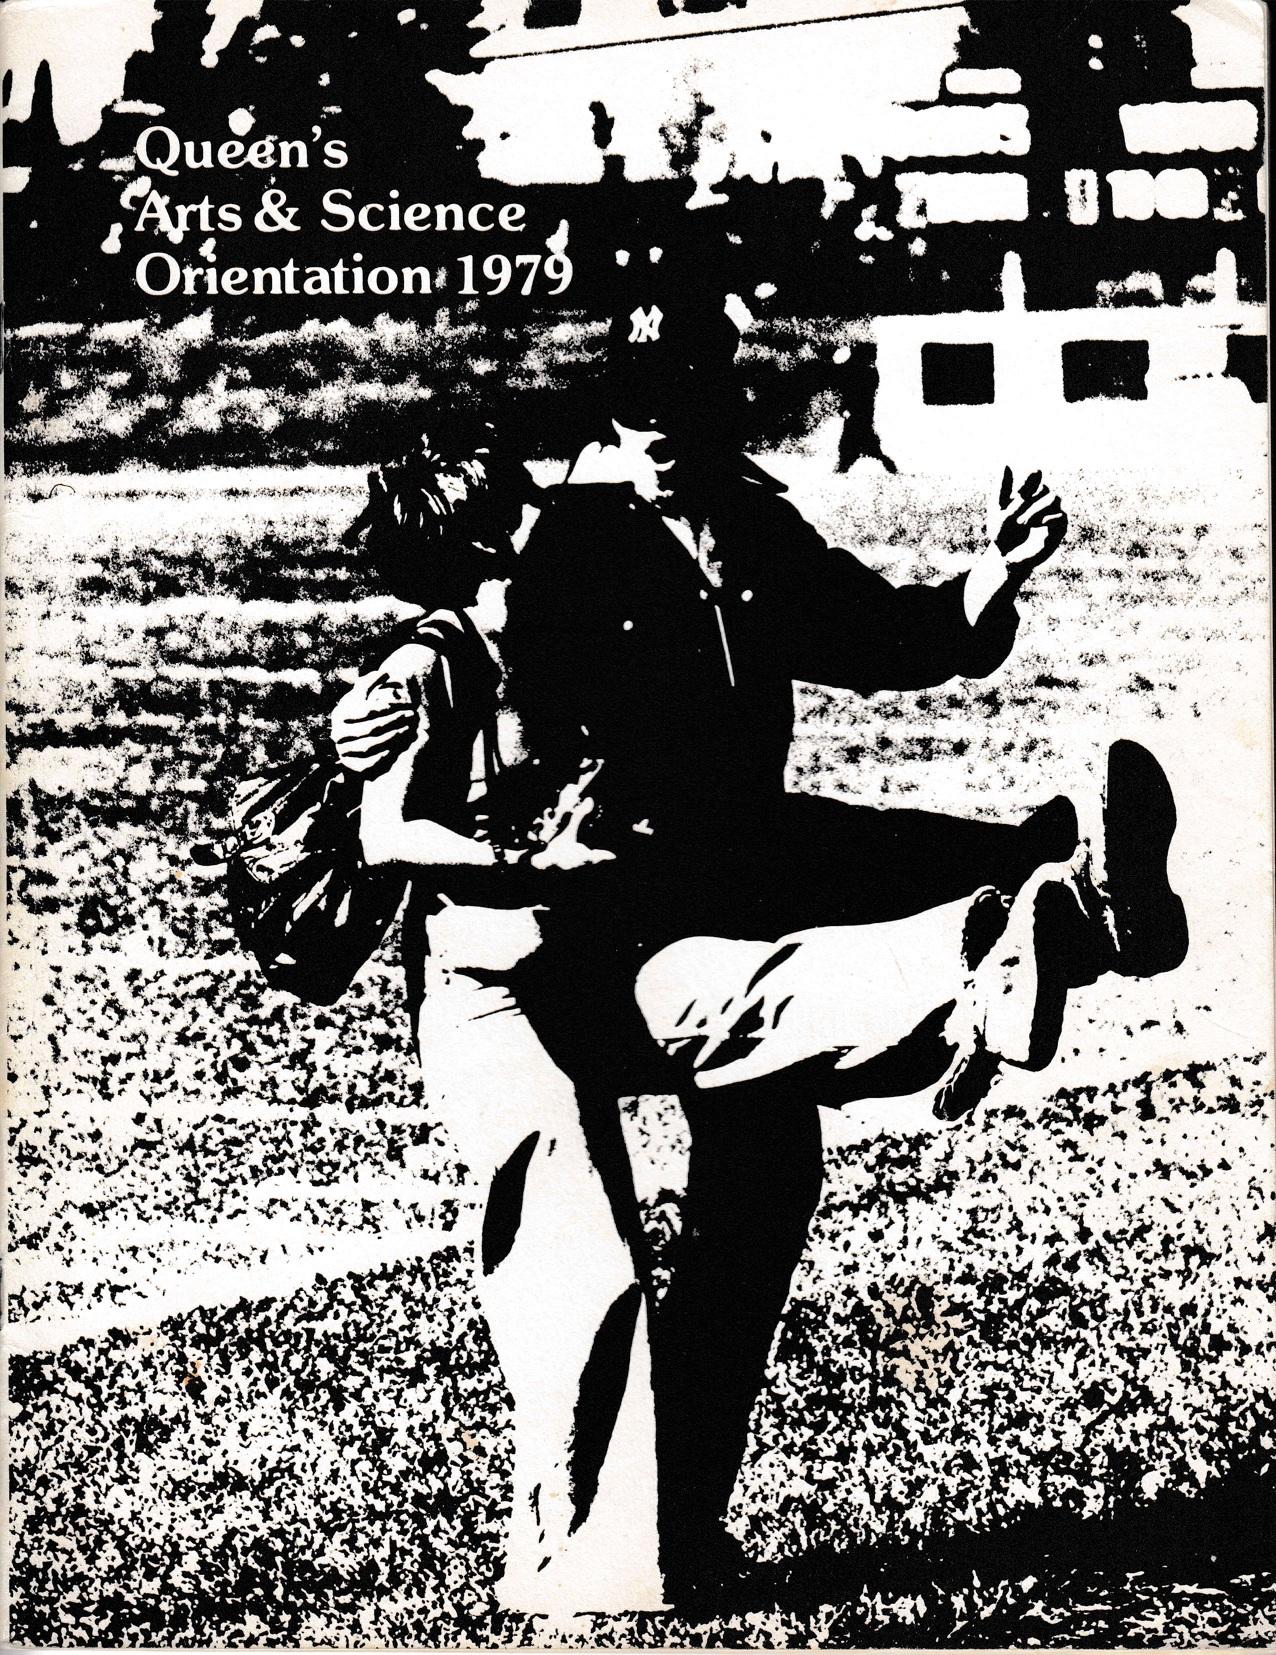 orientation 1979 cover.jpg